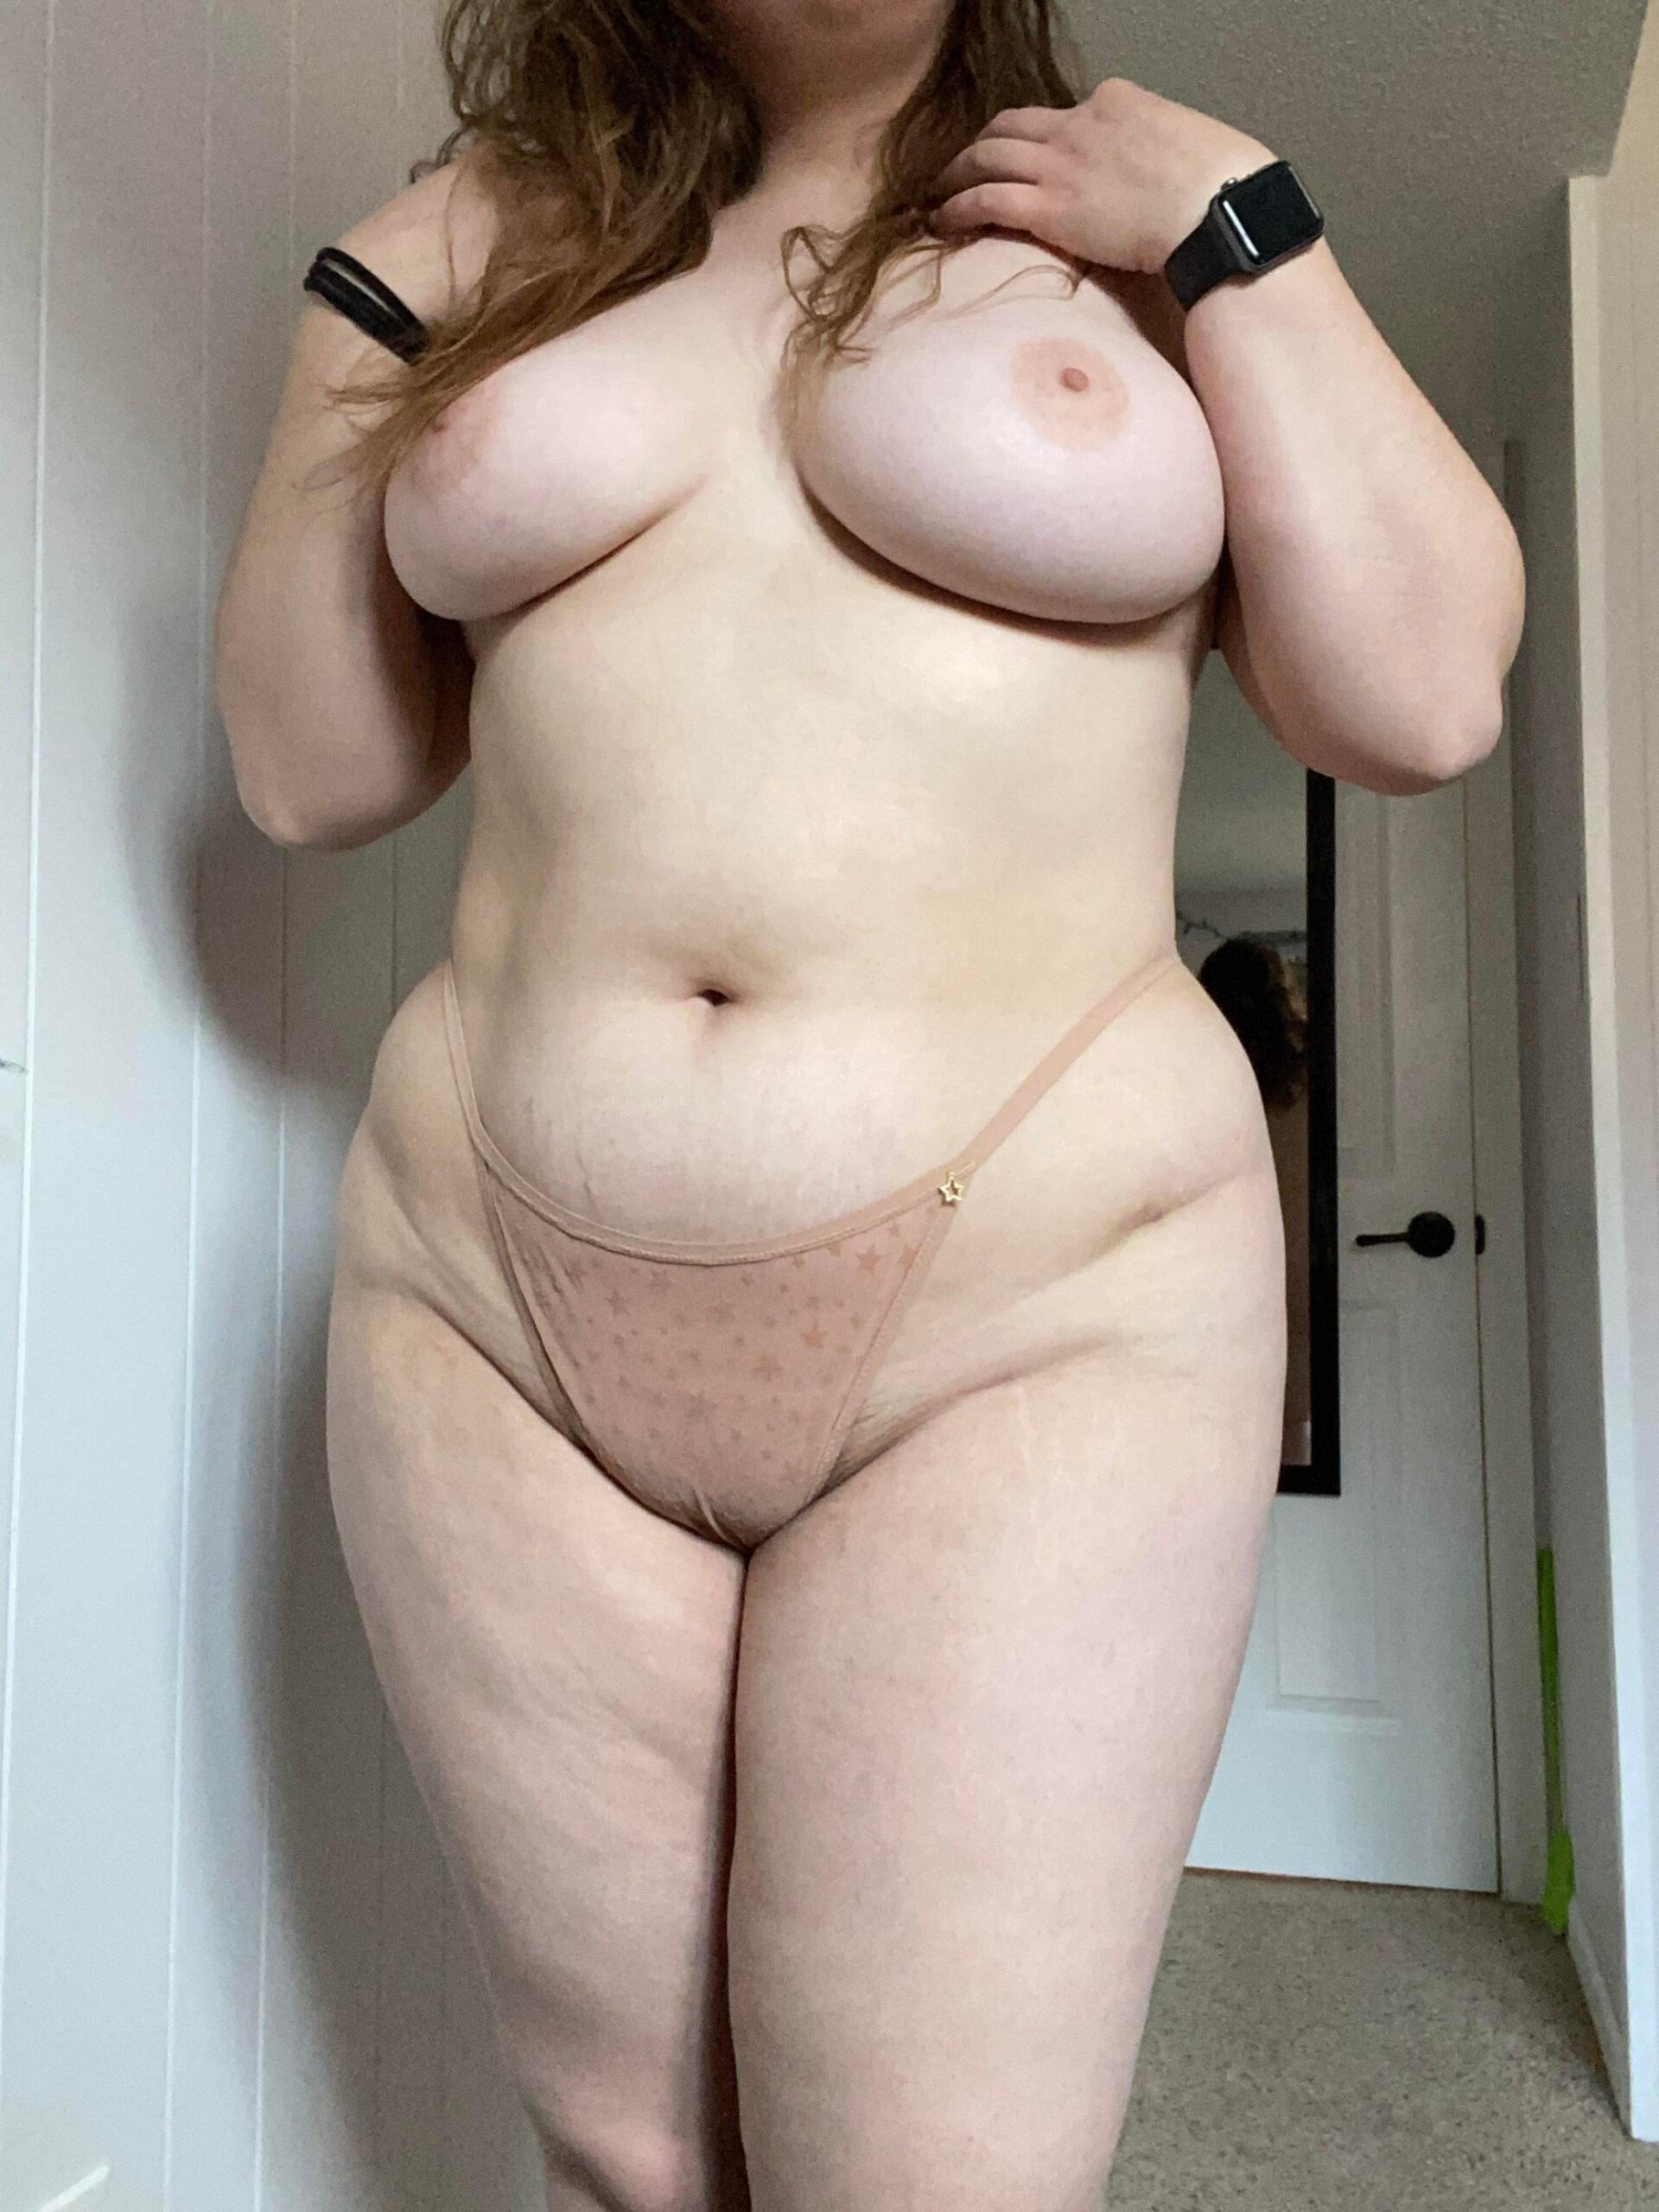 Fotos porno gordas